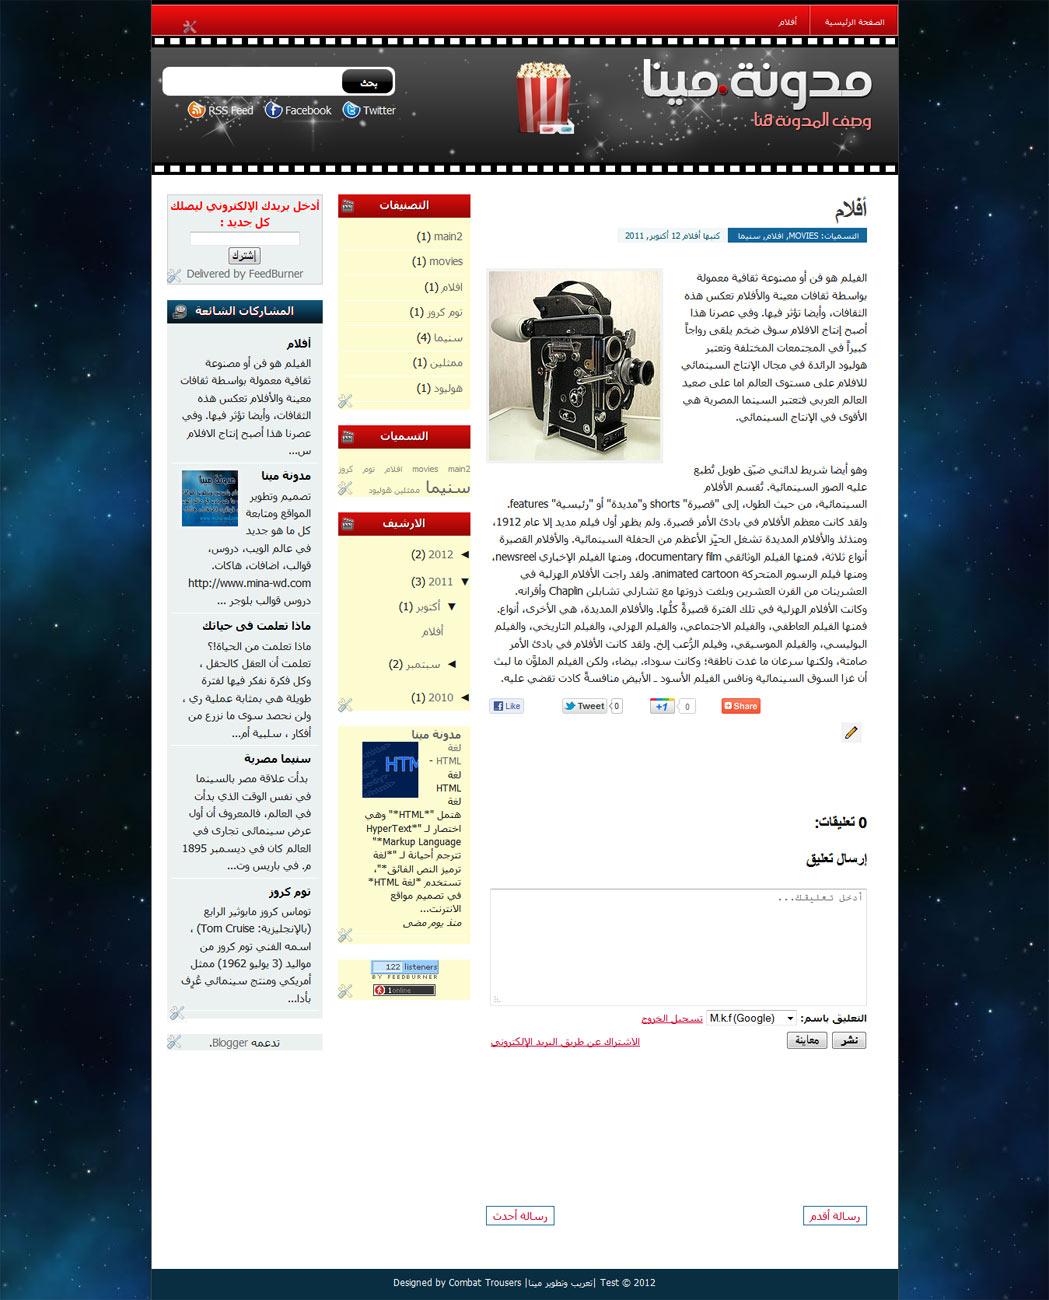 قالب Movie show معرب لمدونات بلوجر  Movie-show-post-blogger-template-www.mina-wd.com